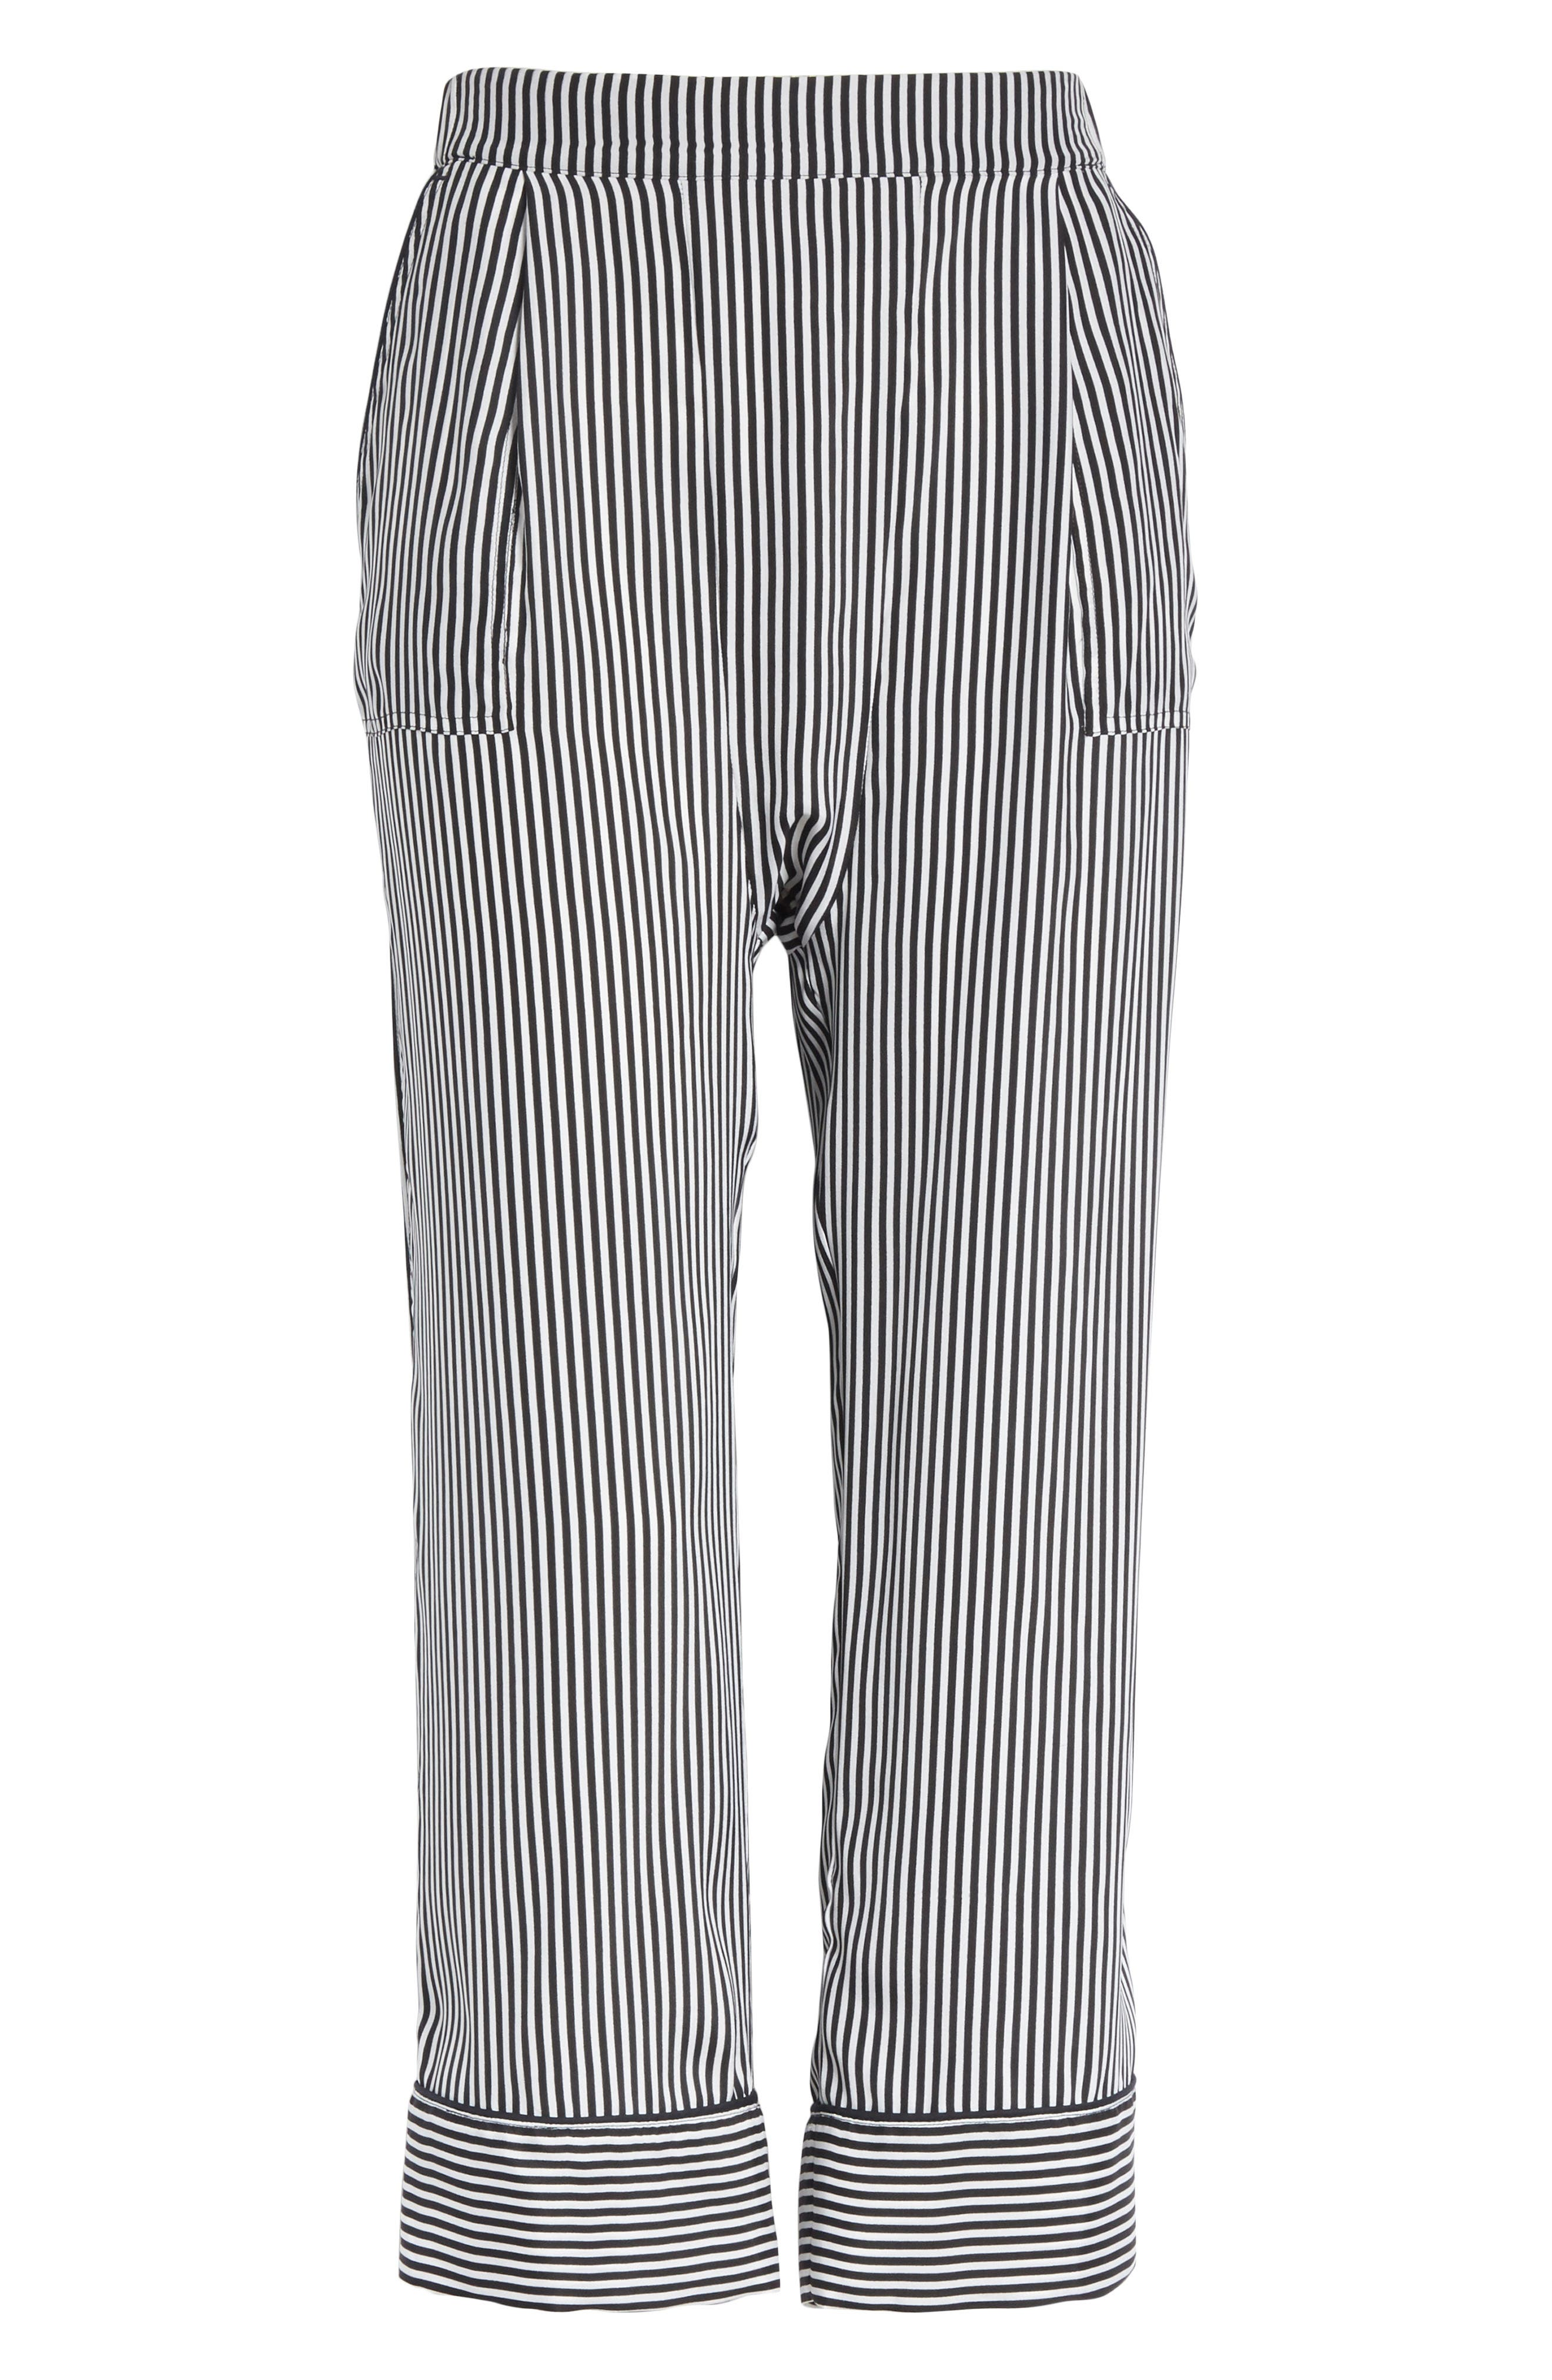 Pencil Stripe Silk Pajama Trousers,                             Alternate thumbnail 6, color,                             001